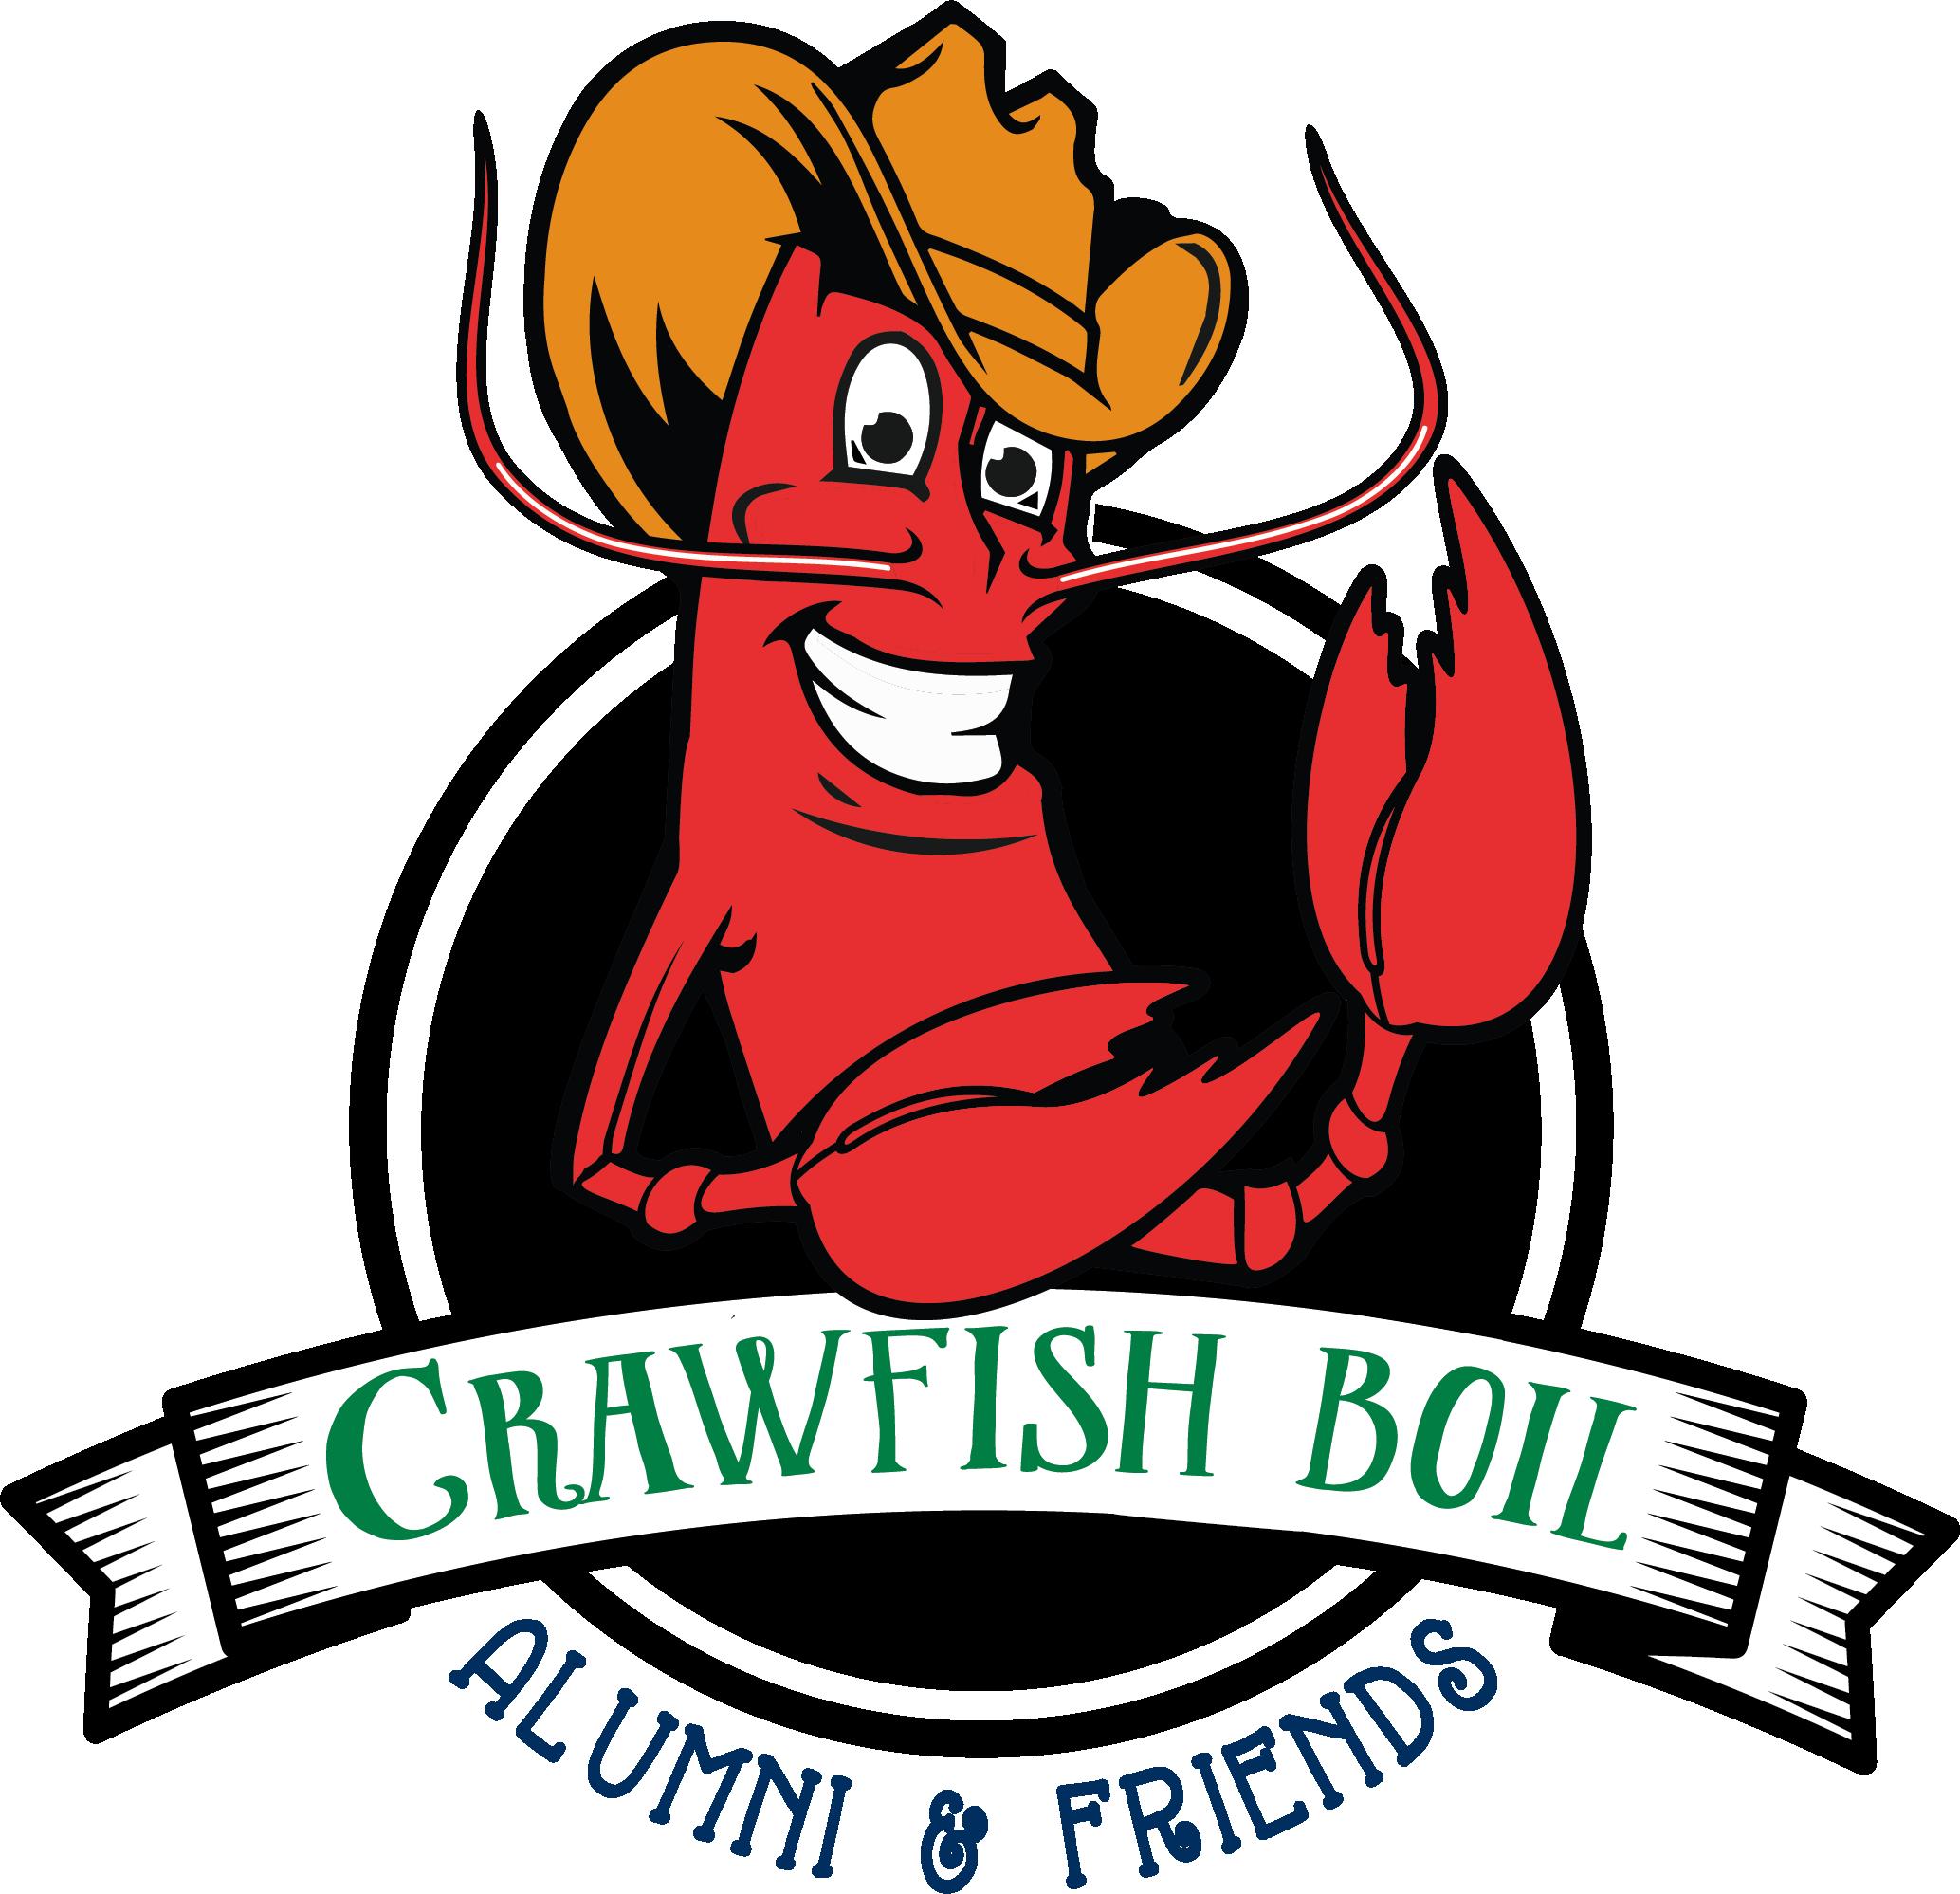 Crawfish Boil Clipart.